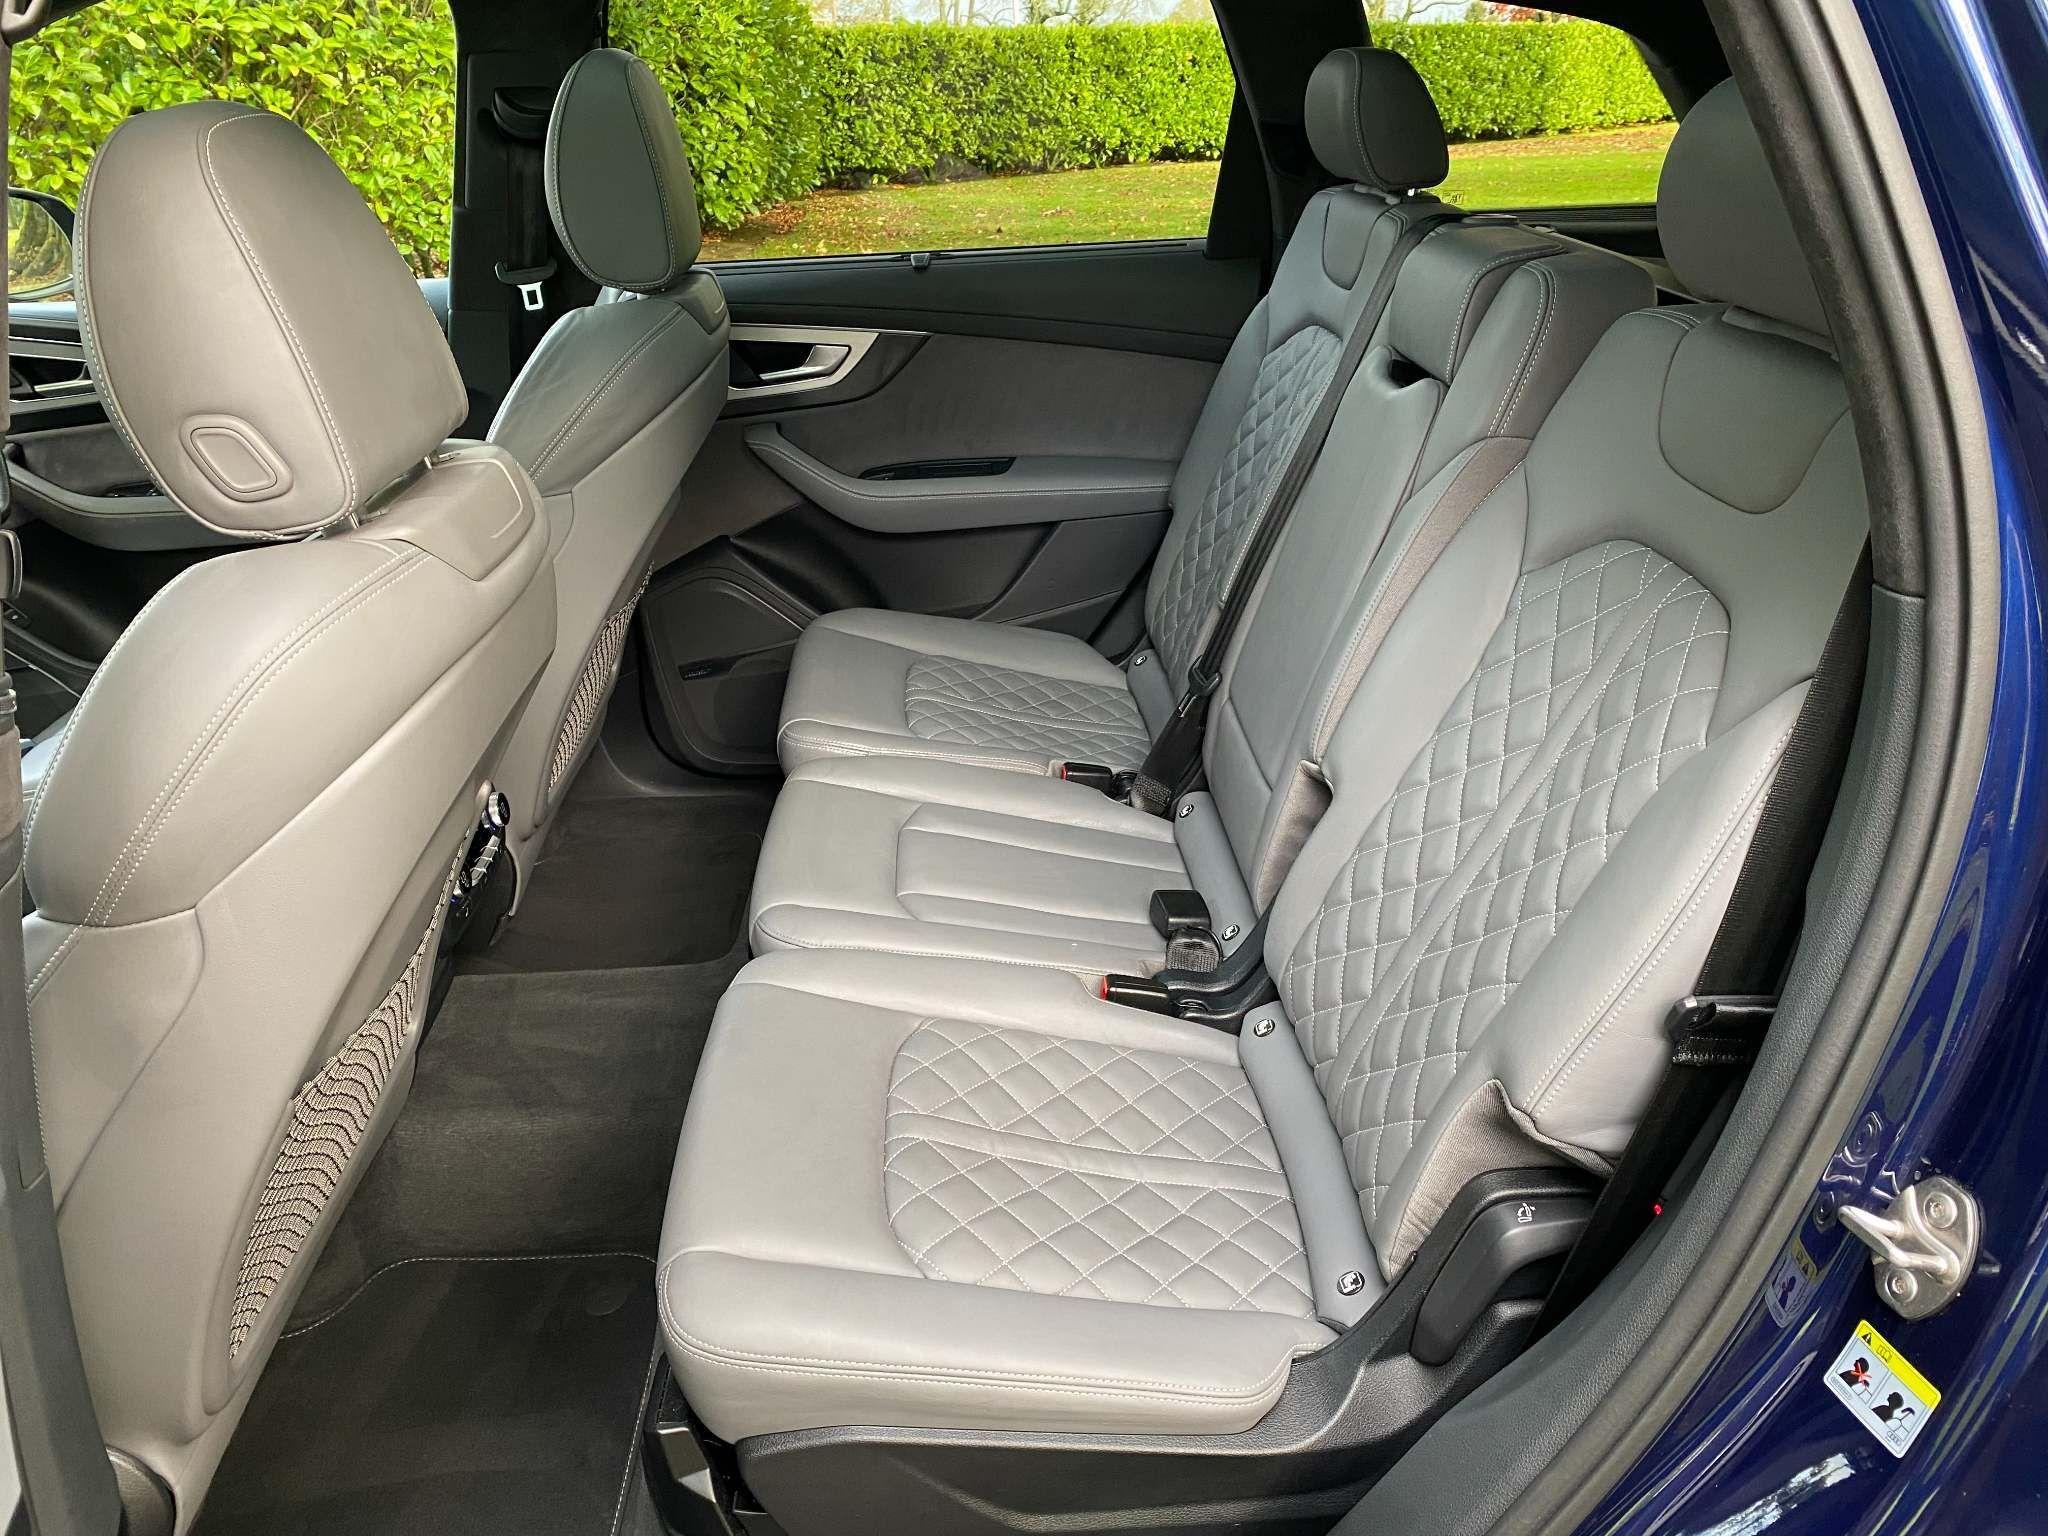 2018 Audi Q7 3.0 TDI V6 Vorsprung Tiptronic quattro (s/s) 5dr Diesel Automatic – Moyway Motors Dungannon full